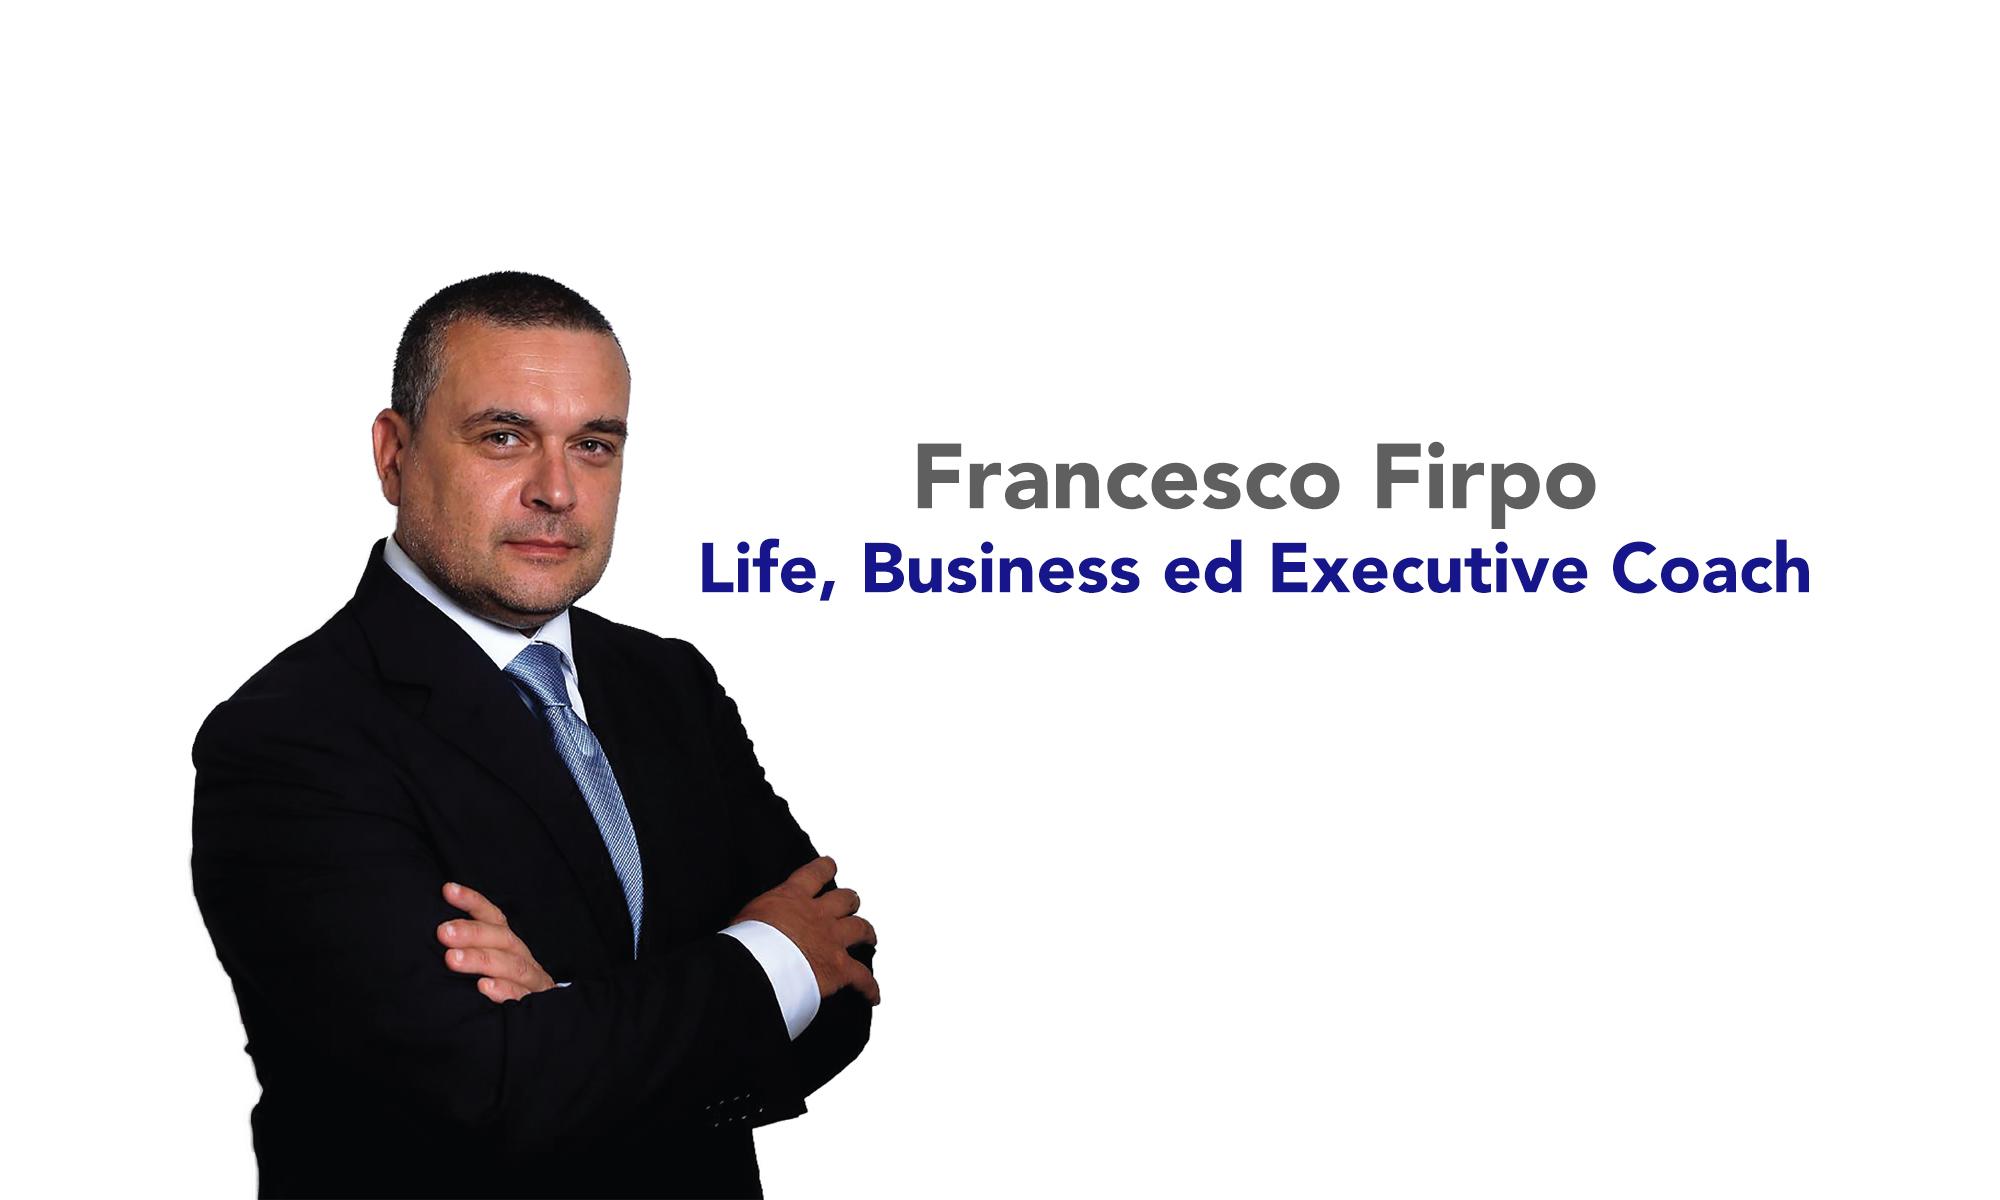 Francesco Firpo - life, business ed executive coach